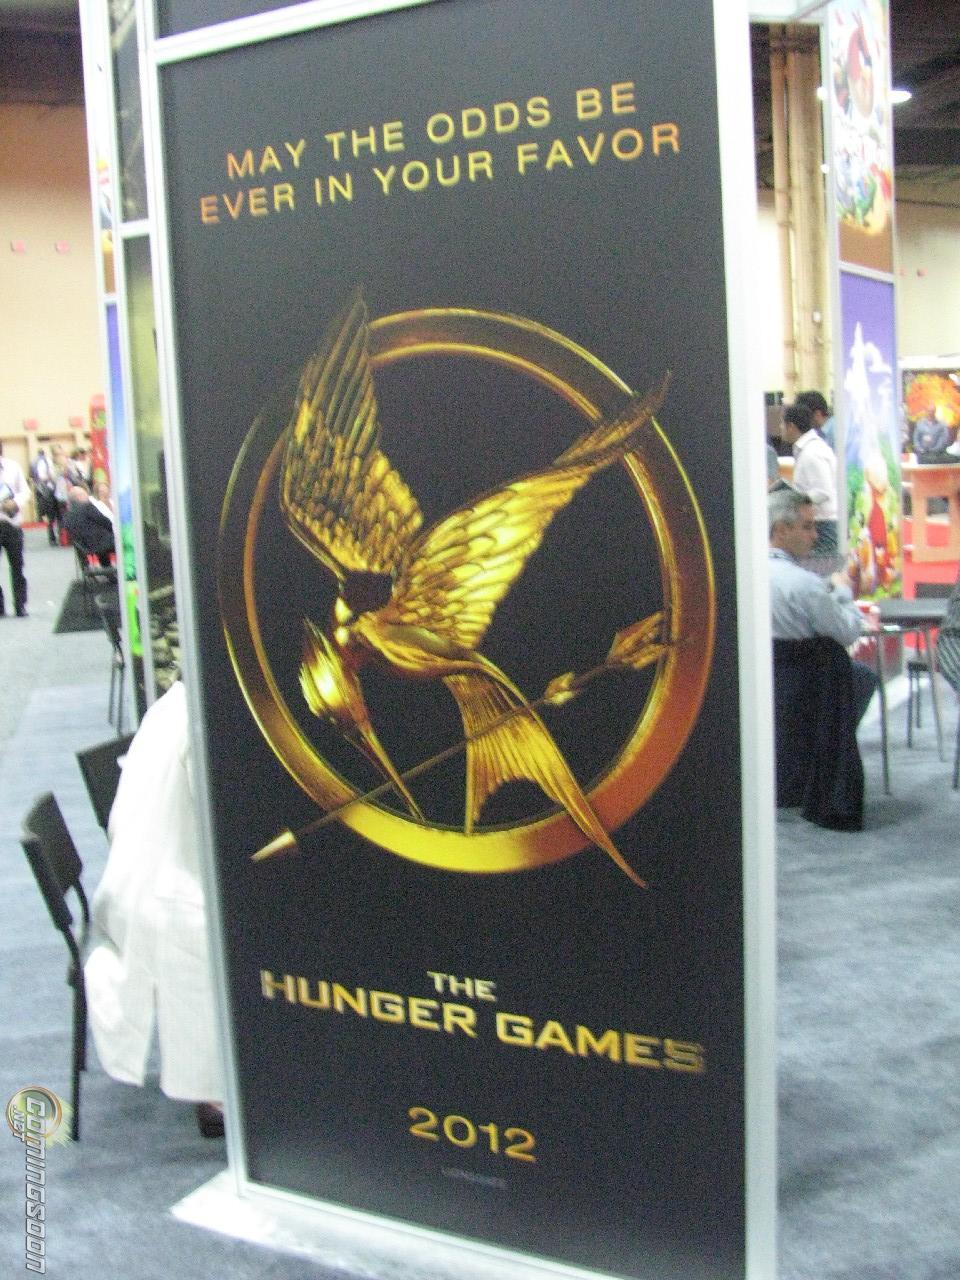 http://collider.com/wp-content/uploads/hunger-games-promo-poster-01.jpg